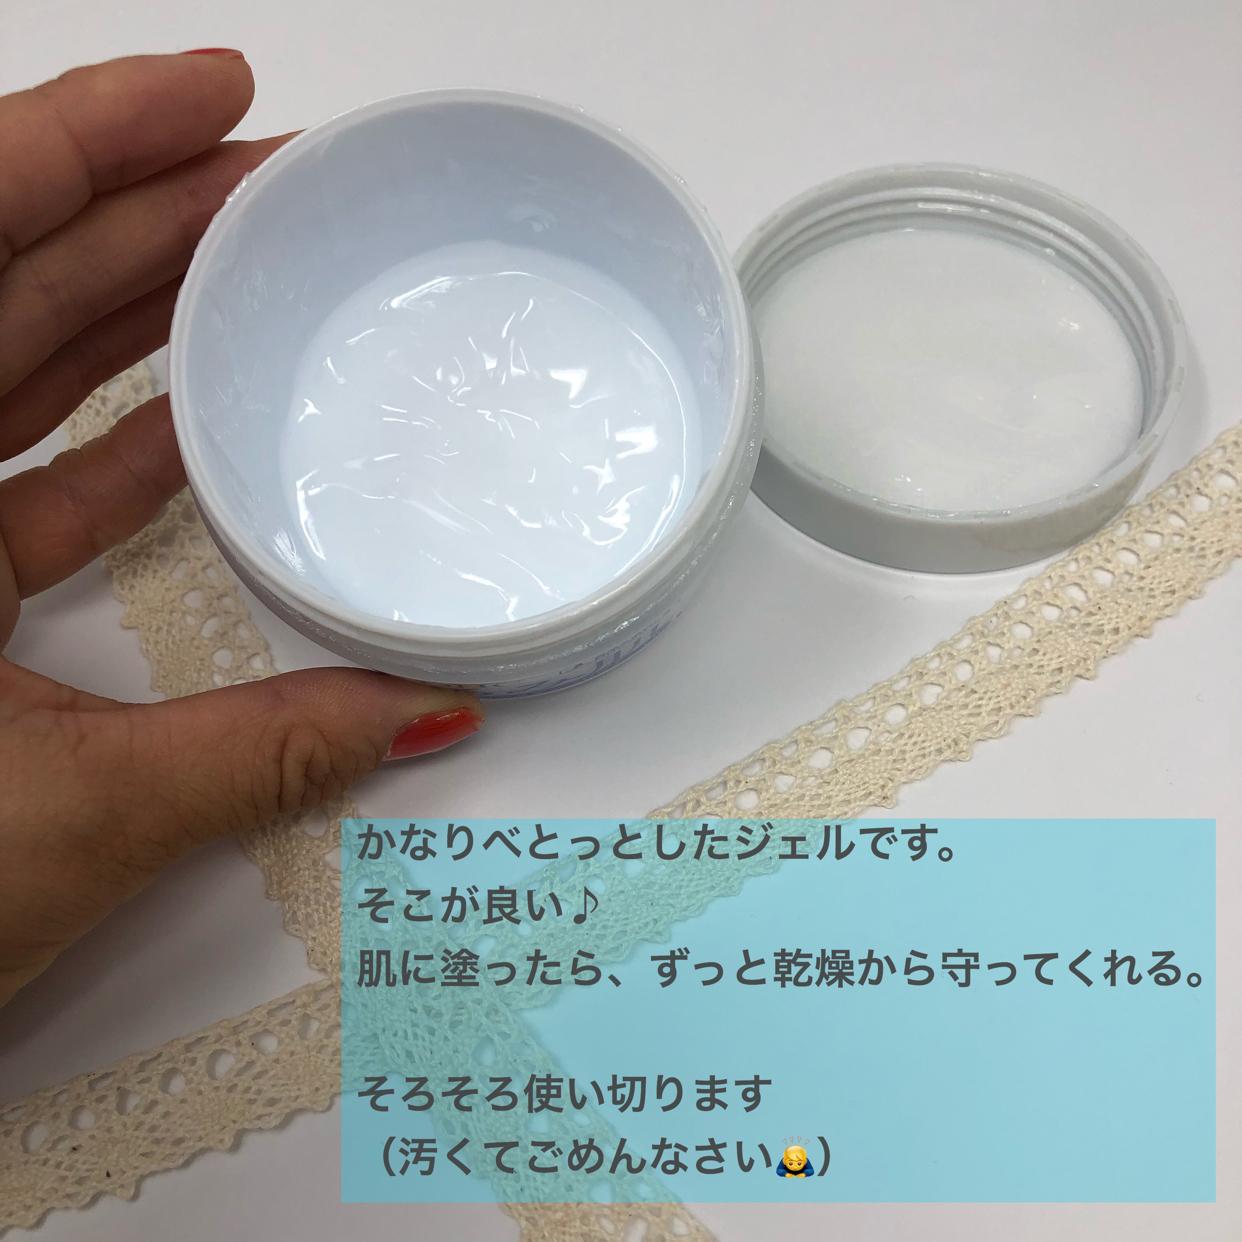 DHC DHC濃密うるみ肌 薬用美白ワンステップリッチジェル(医薬部外品)(フェイスクリーム・スキンケアクリーム)を使ったクチコミ(2枚目)